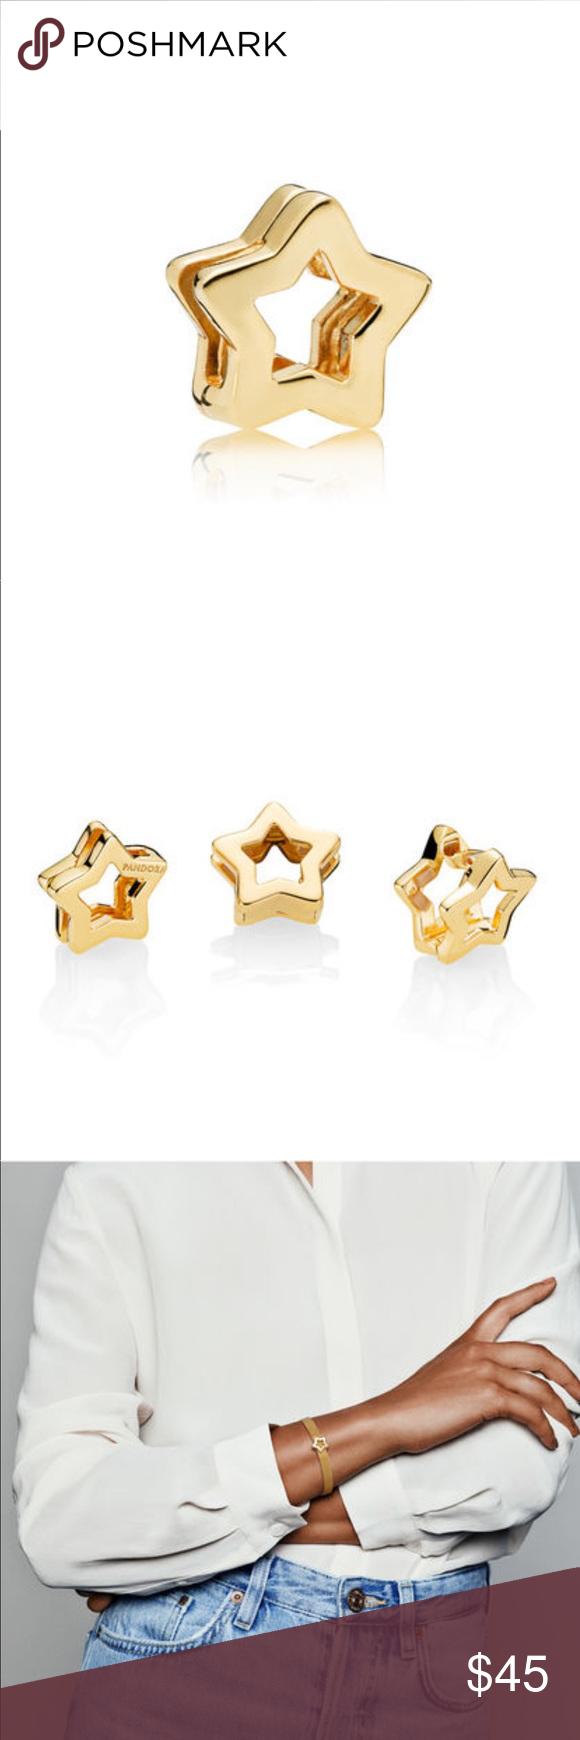 PANDORA REFLEXIONS™ SLEEK STAR CLIP CHARM   Fashion, Fashion ...